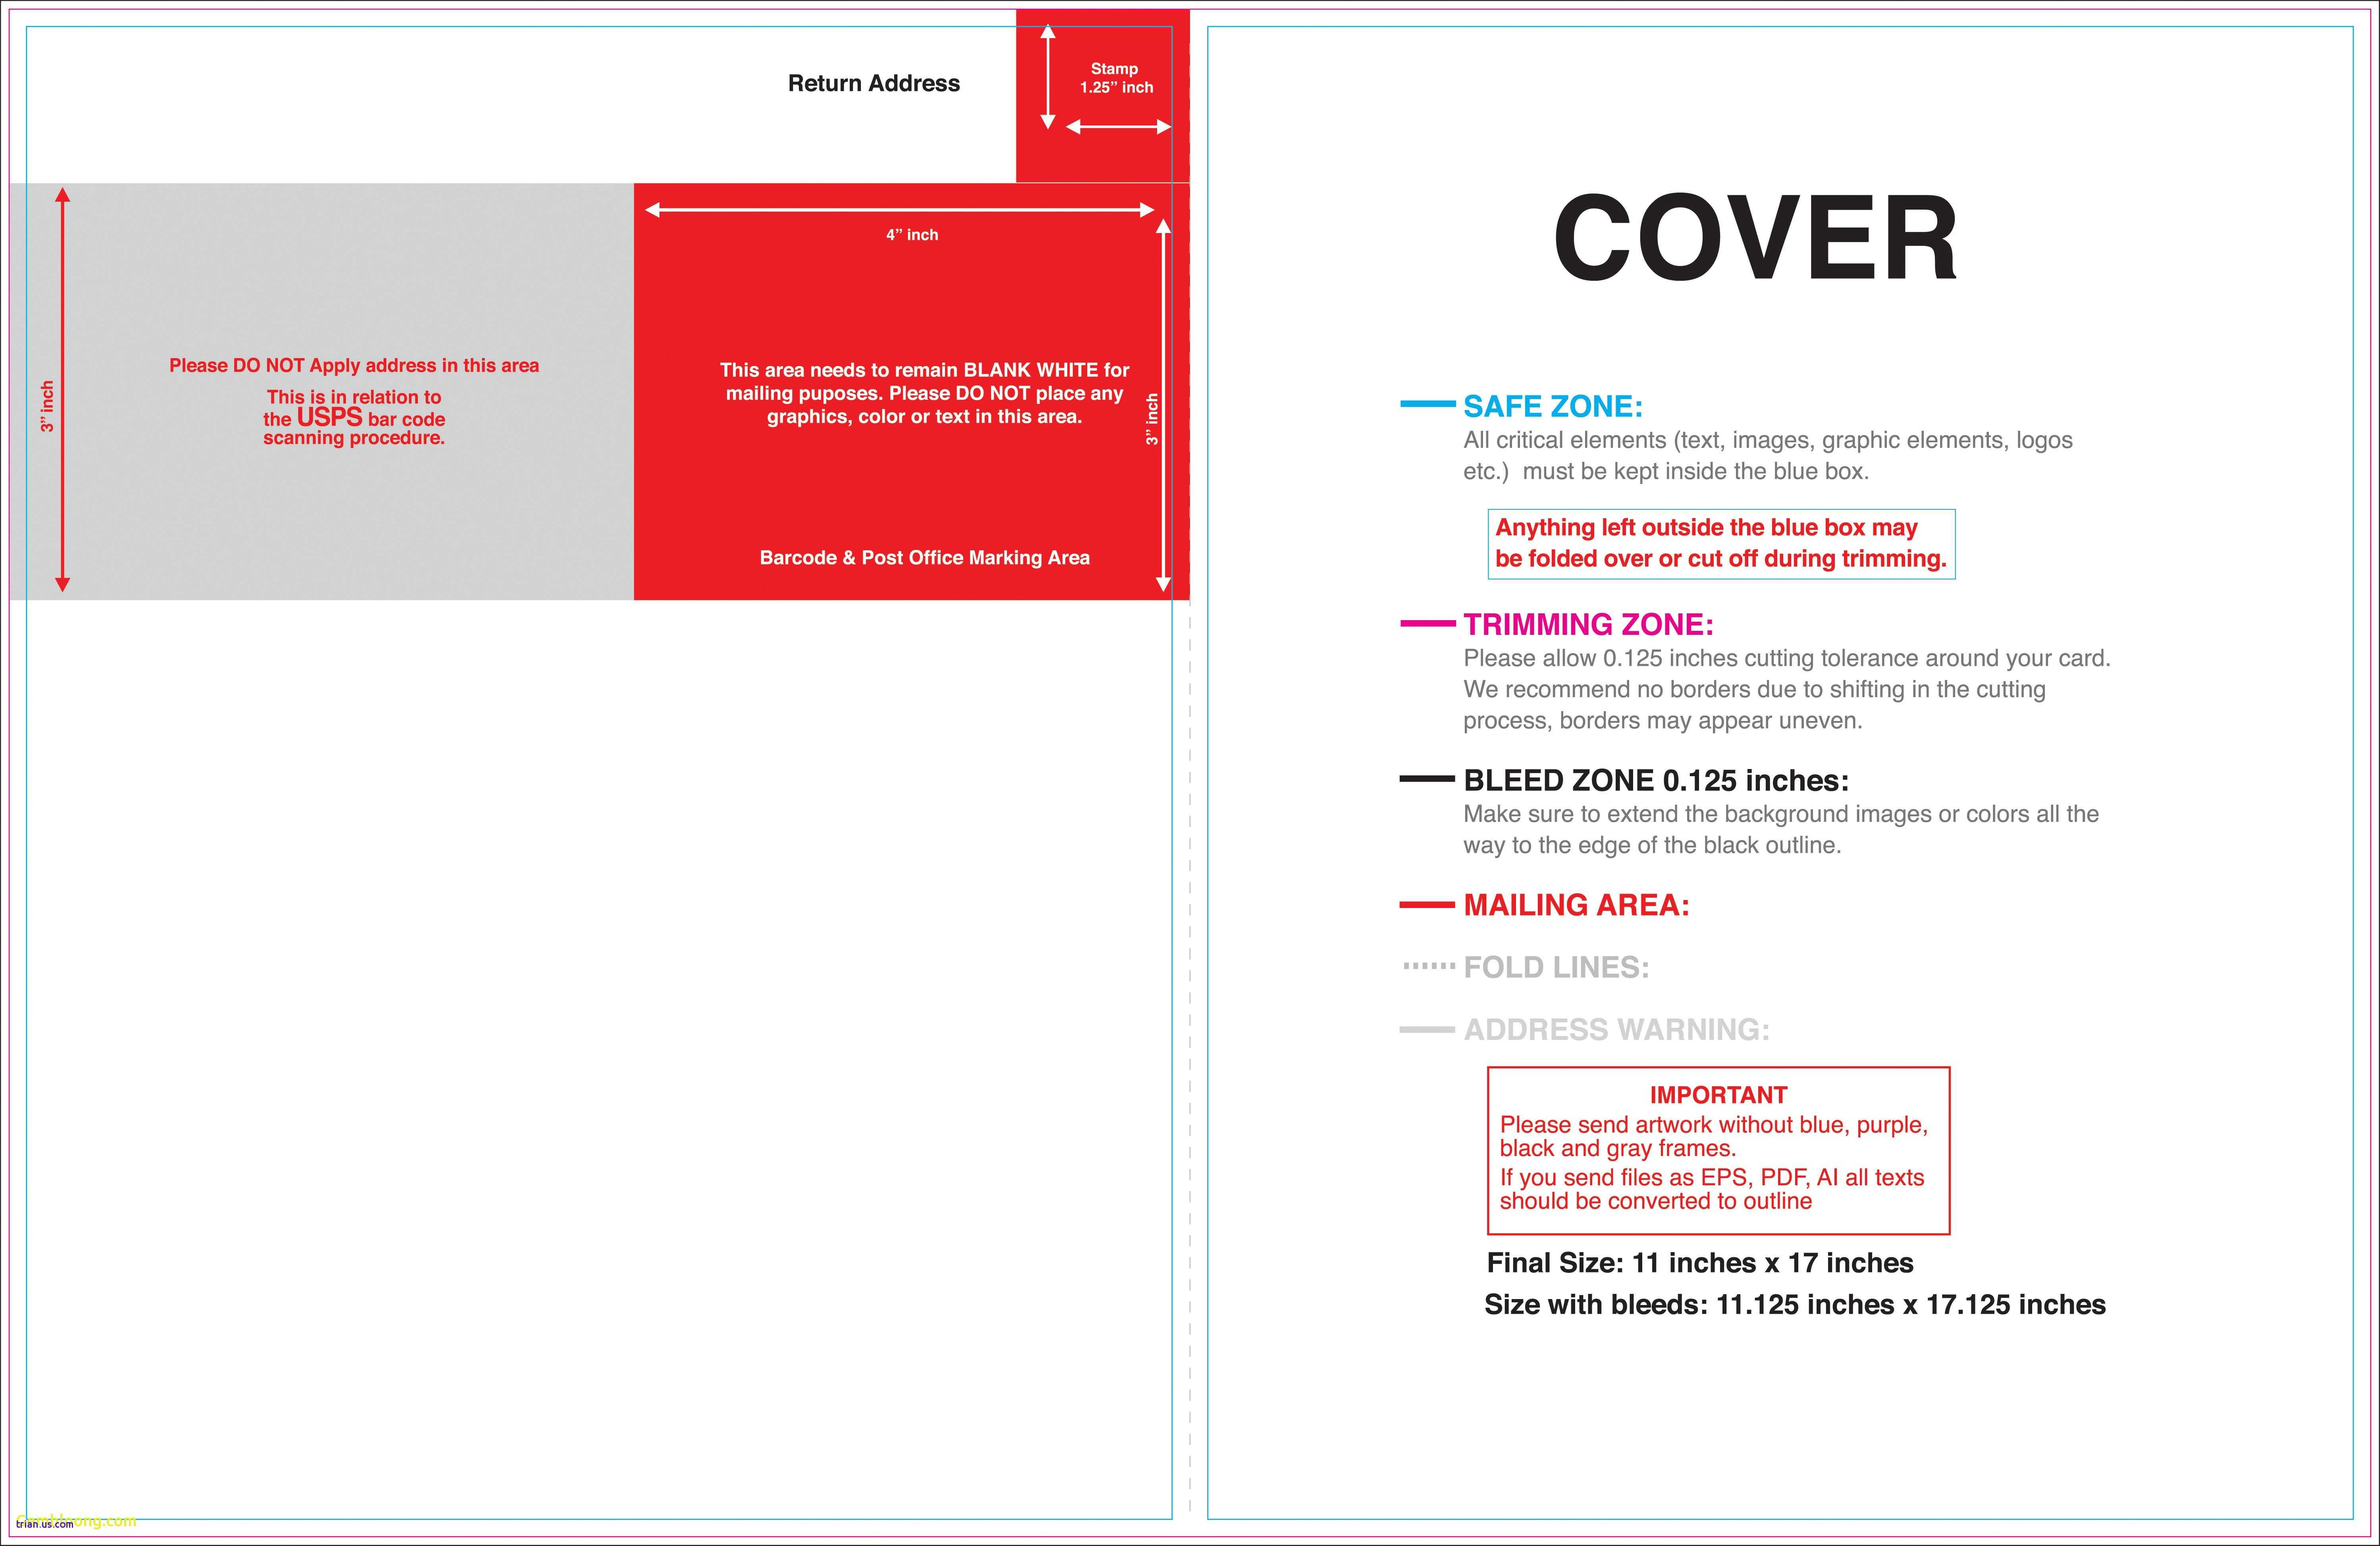 11X17 Half Fold Brochure Template Ideas 11Times17 Templates For 11X17 Brochure Template